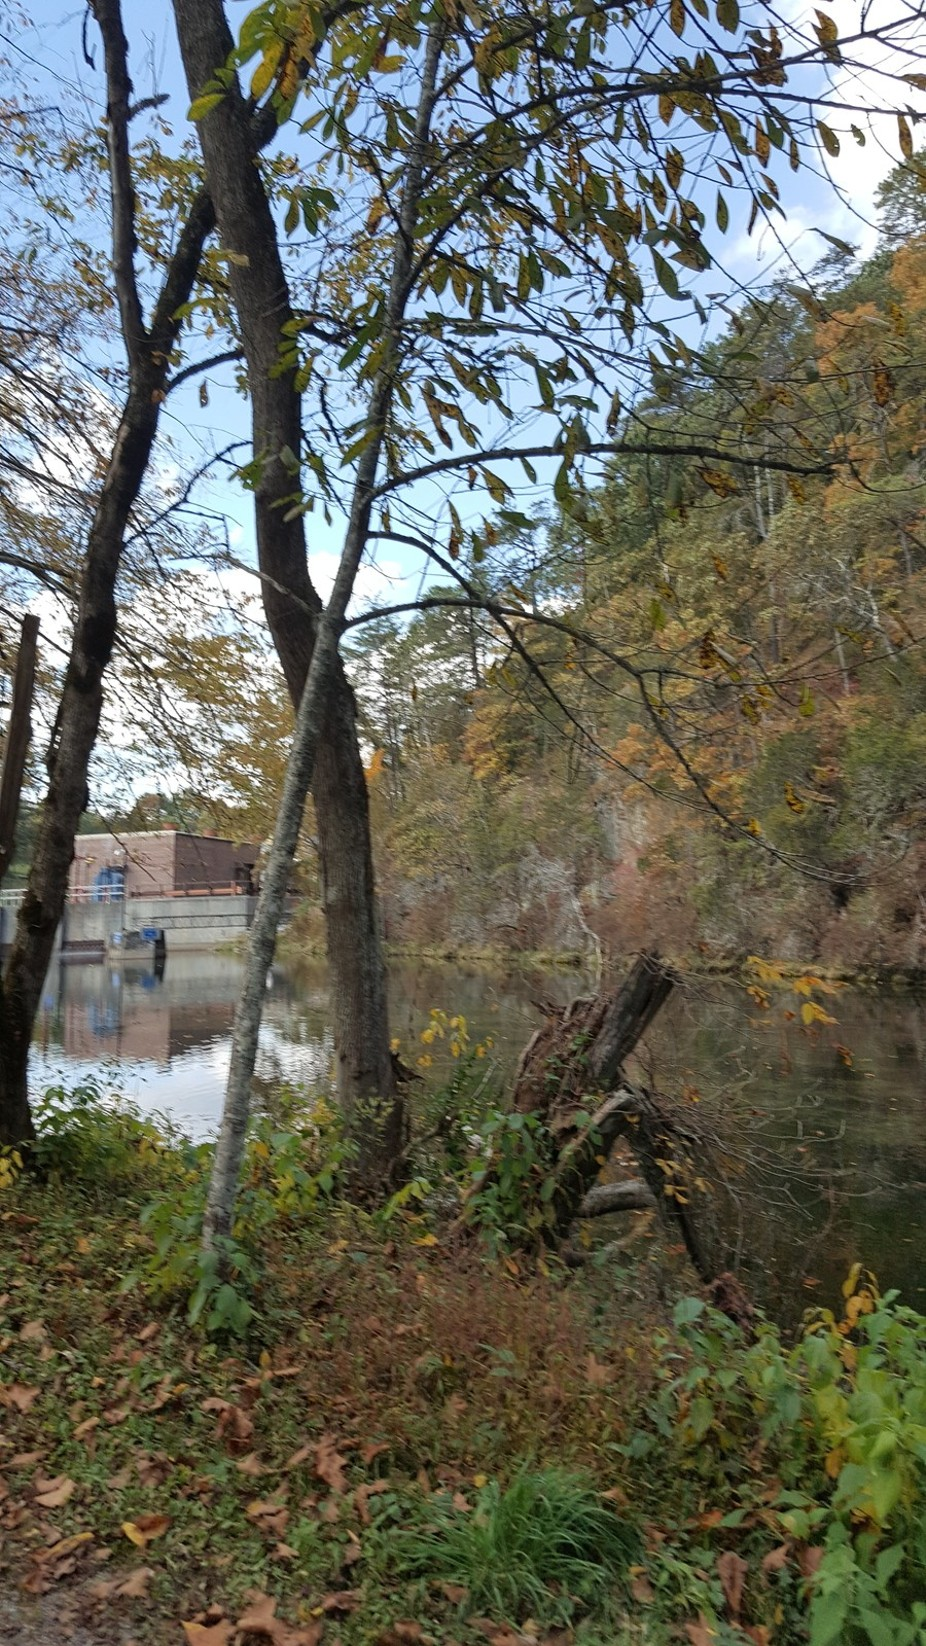 South Holston Dam Oct 17, 2016